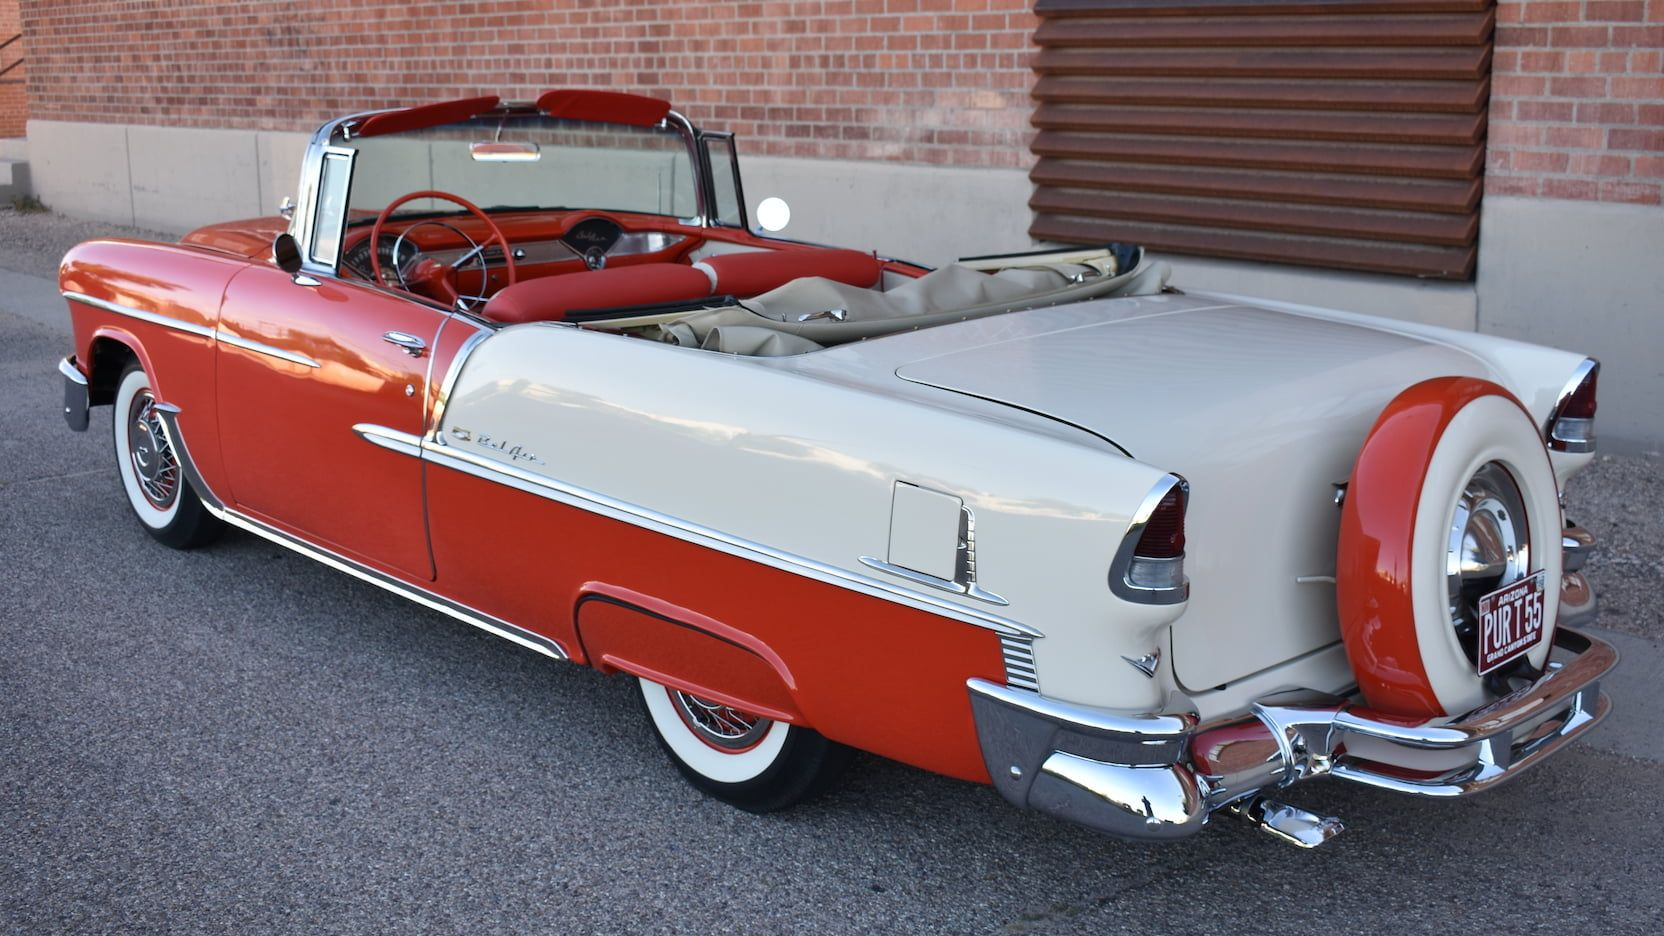 1955 Chevrolet Bel Air Convertible Classic Cars Chevrolet Bel Air 1955 Chevrolet